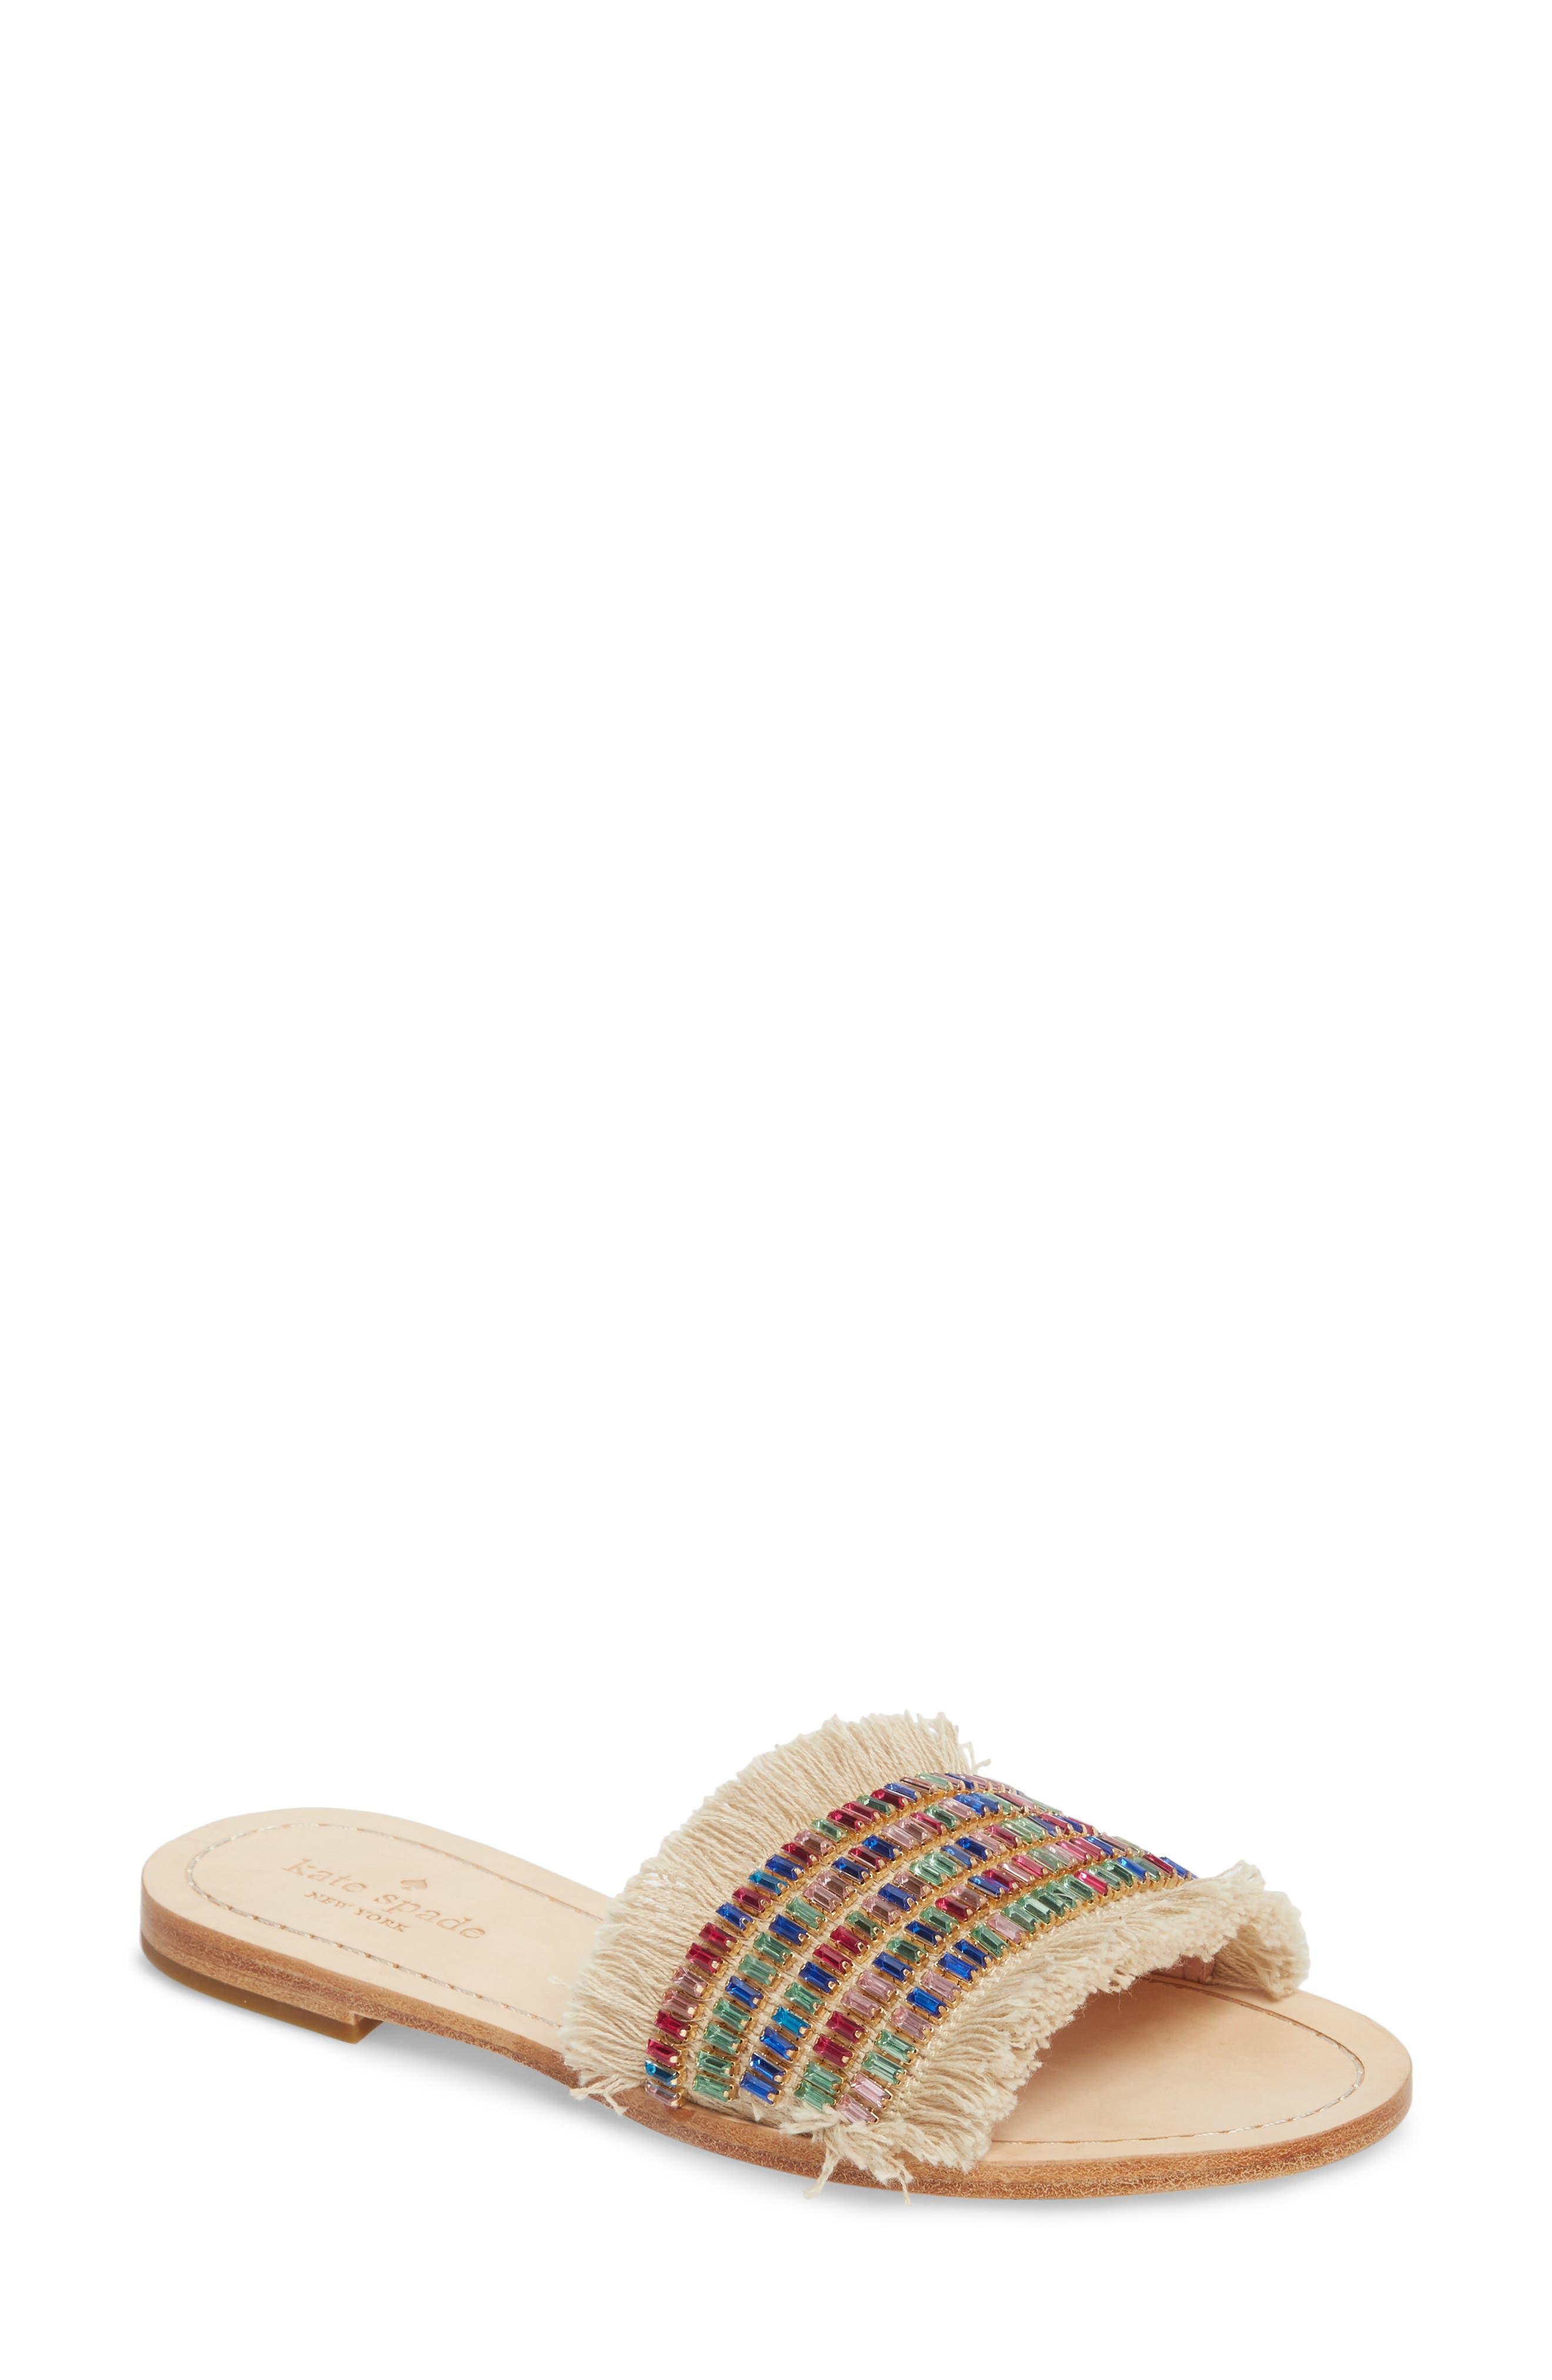 solaina slide sandal,                             Main thumbnail 2, color,